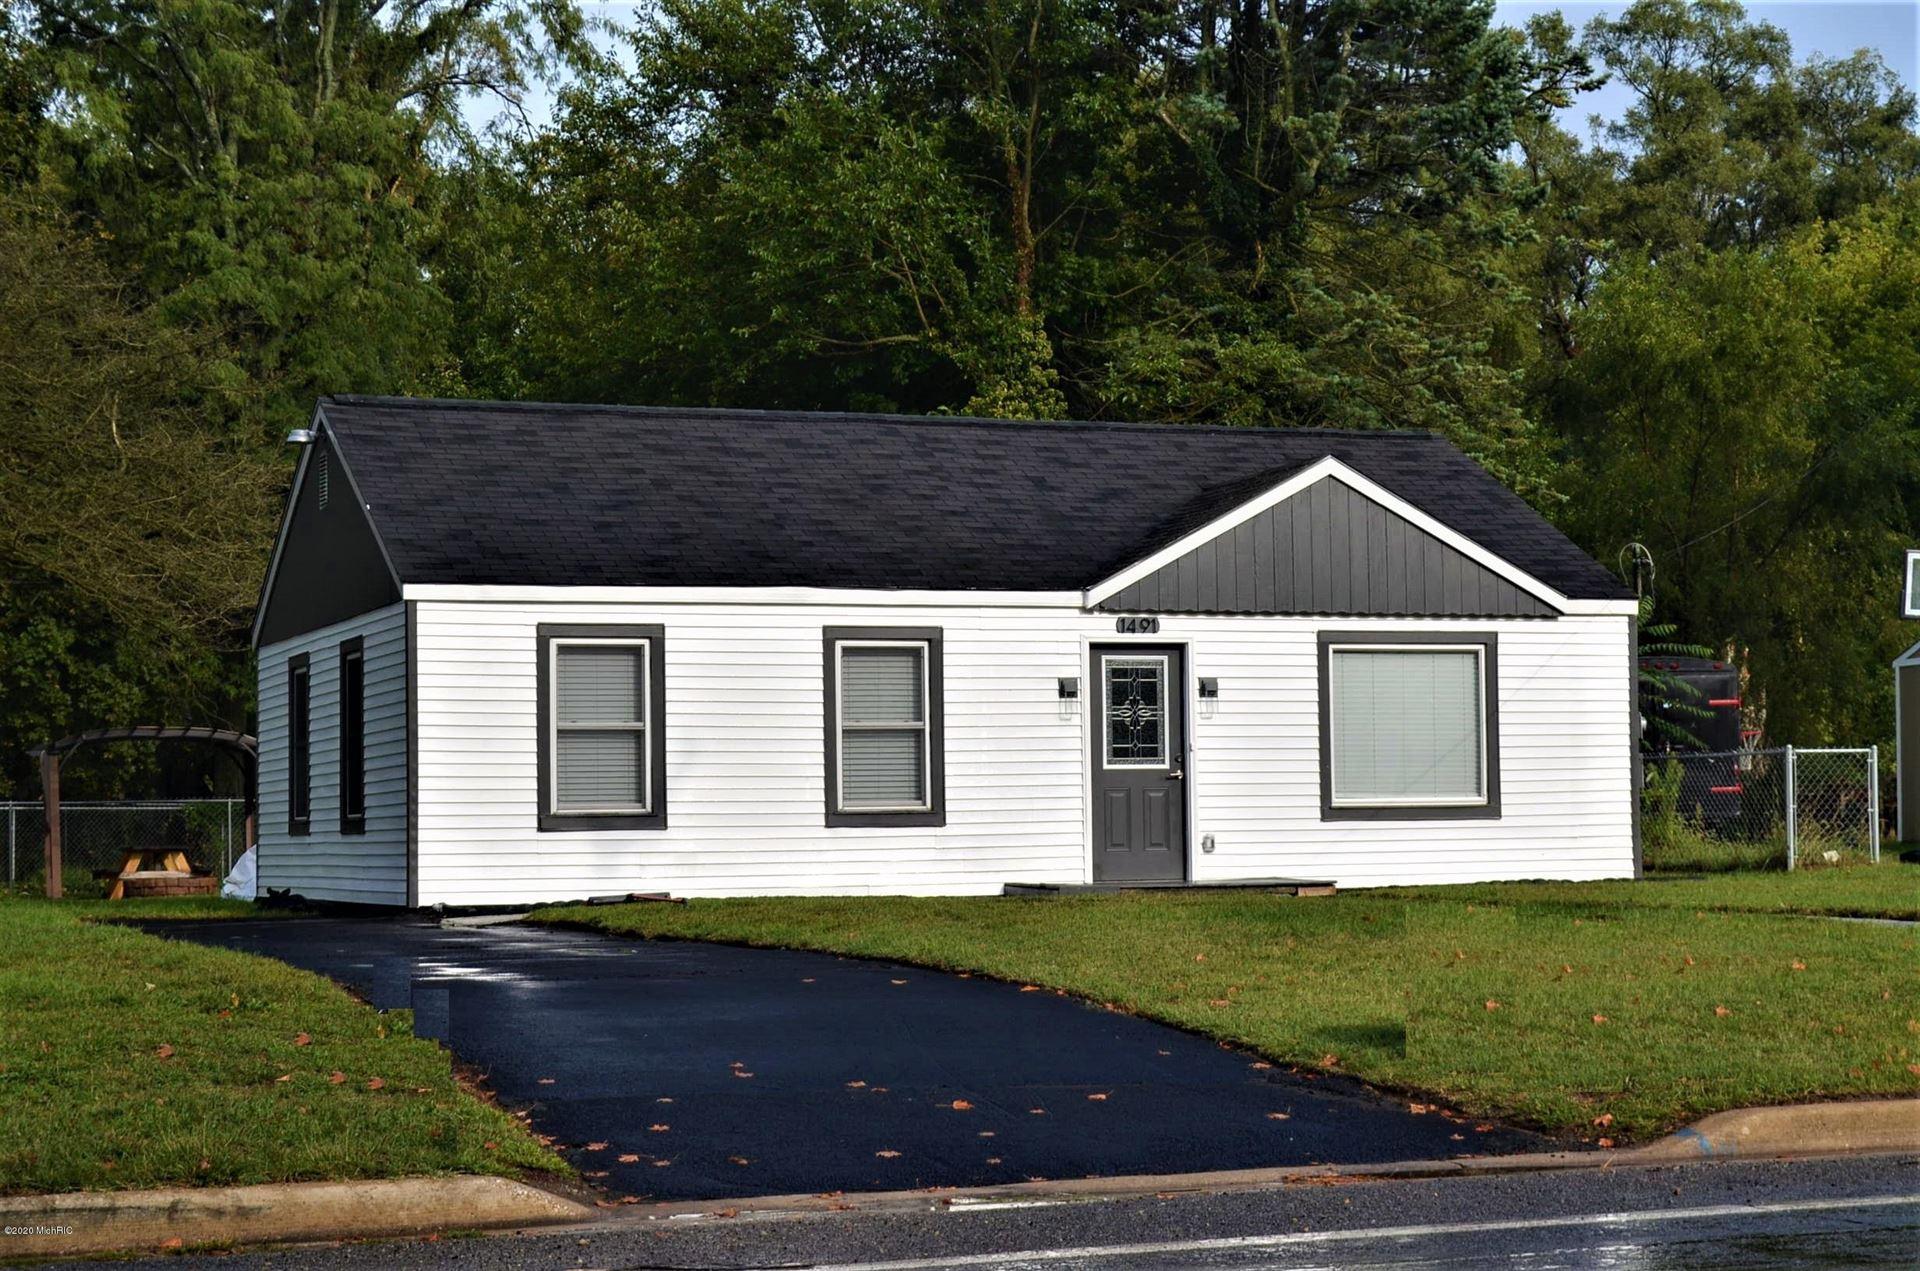 1491 Colfax Avenue, Benton Harbor, MI 49022 - MLS#: 20037321